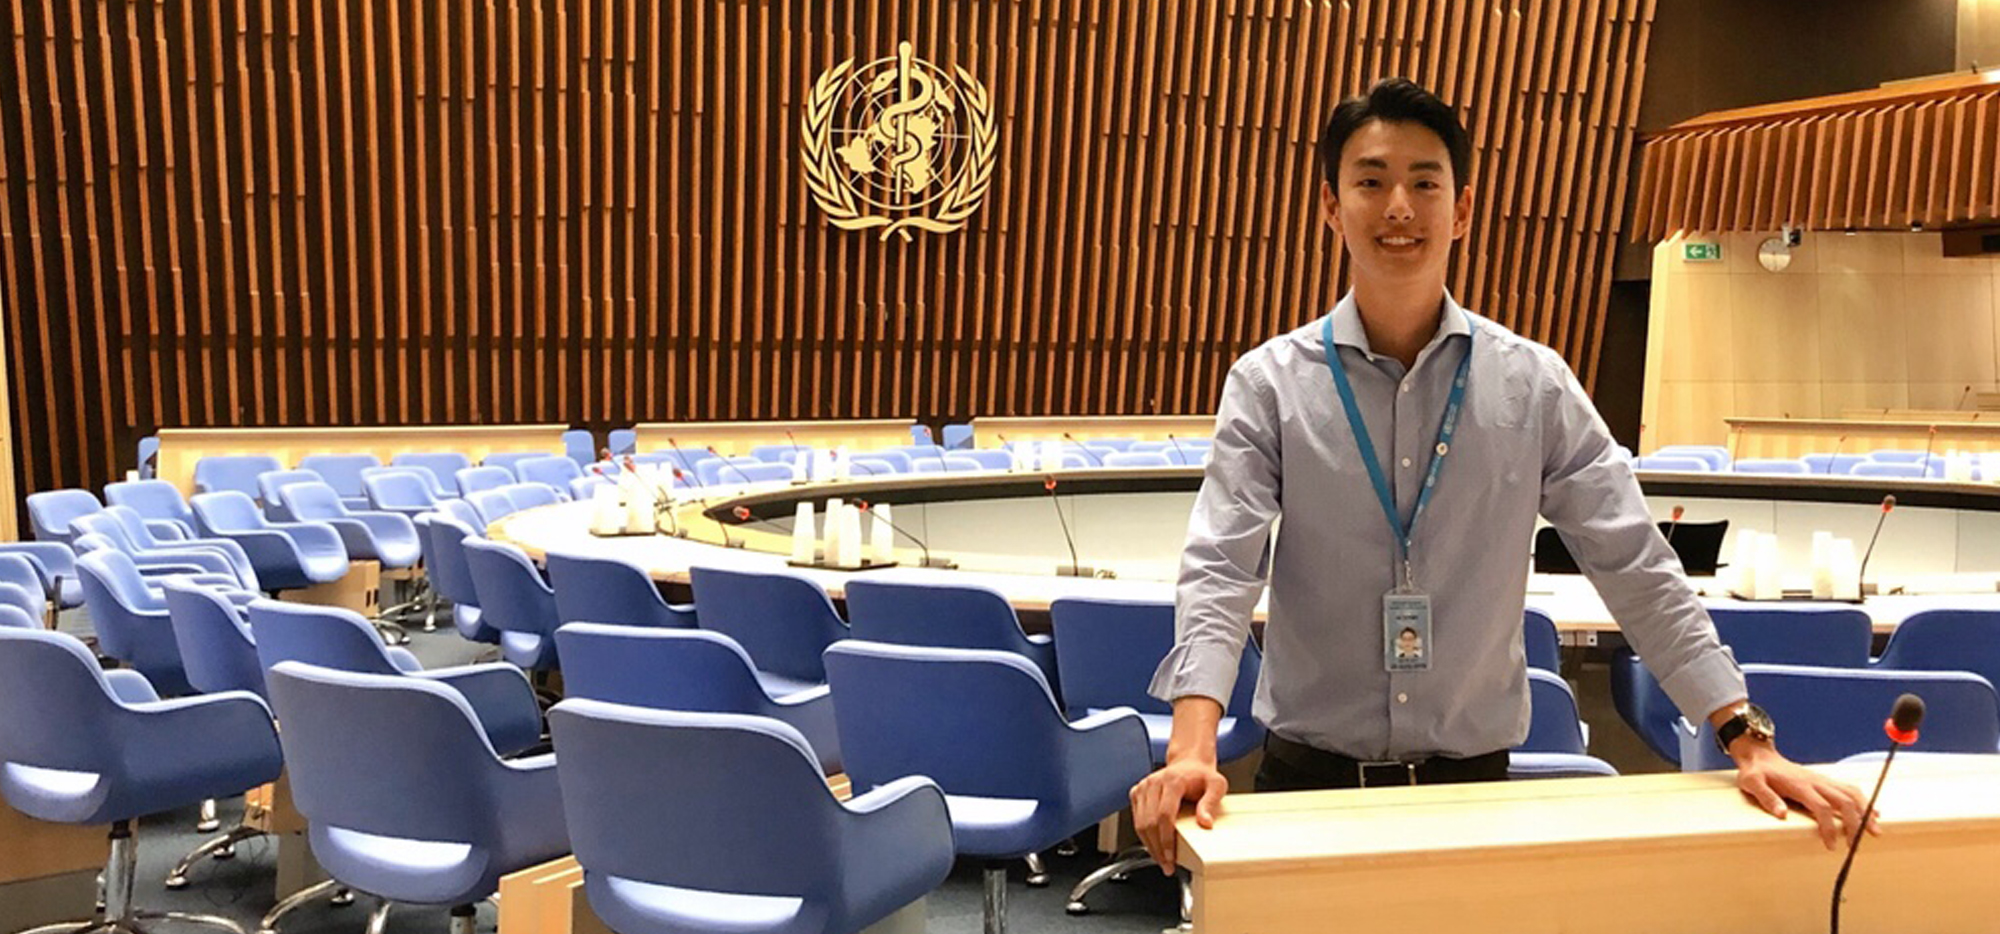 John Kim standing inside the World Health Organization buildng